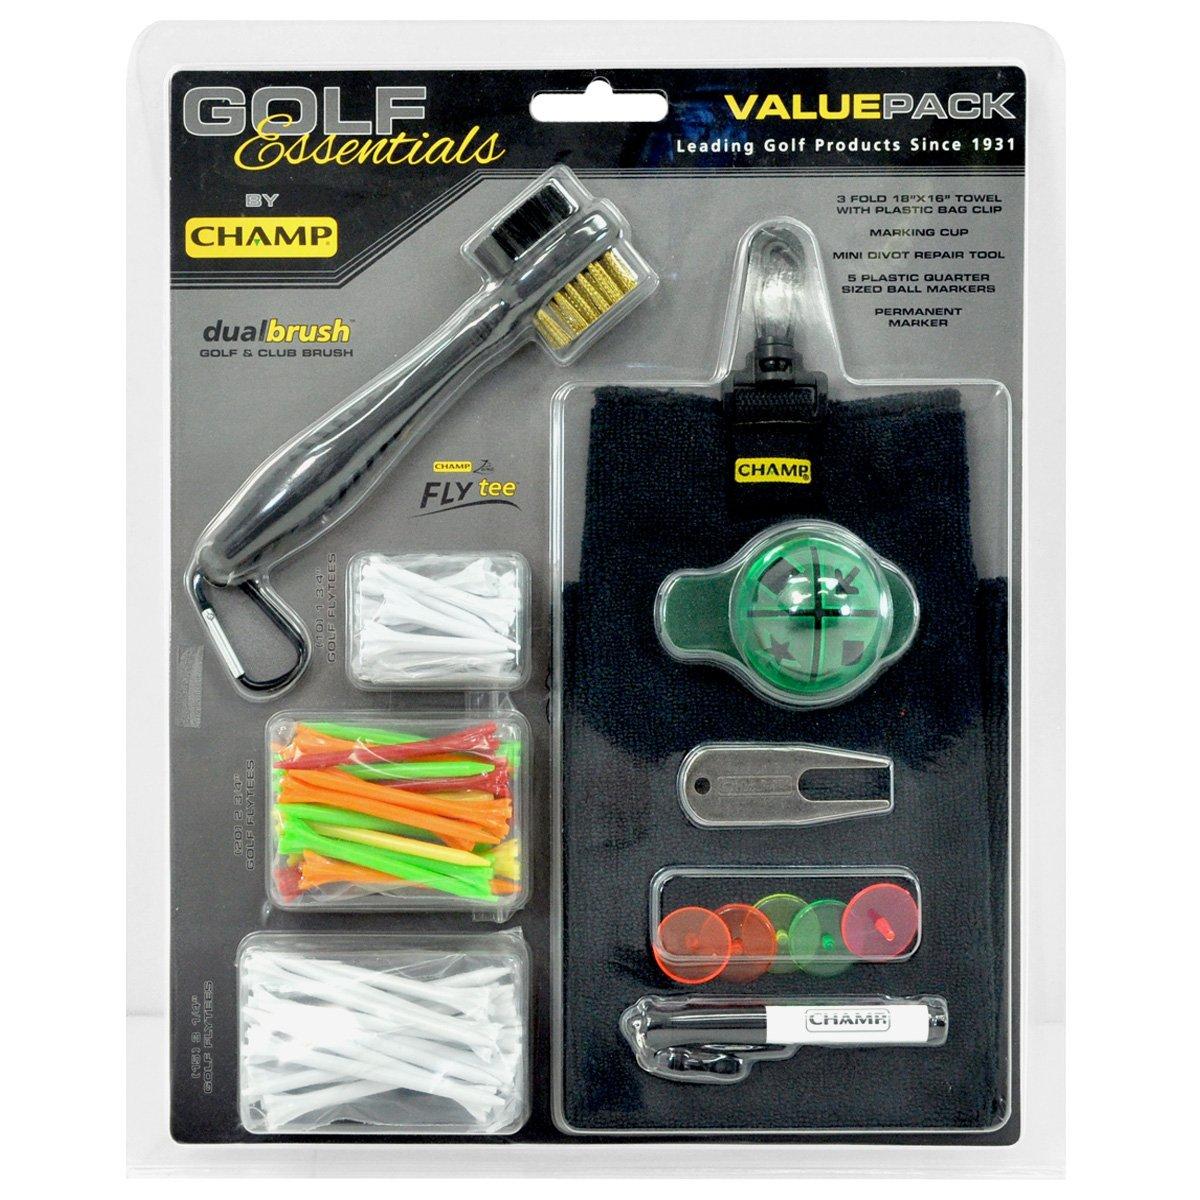 Champ Golf Essentials Value Pack